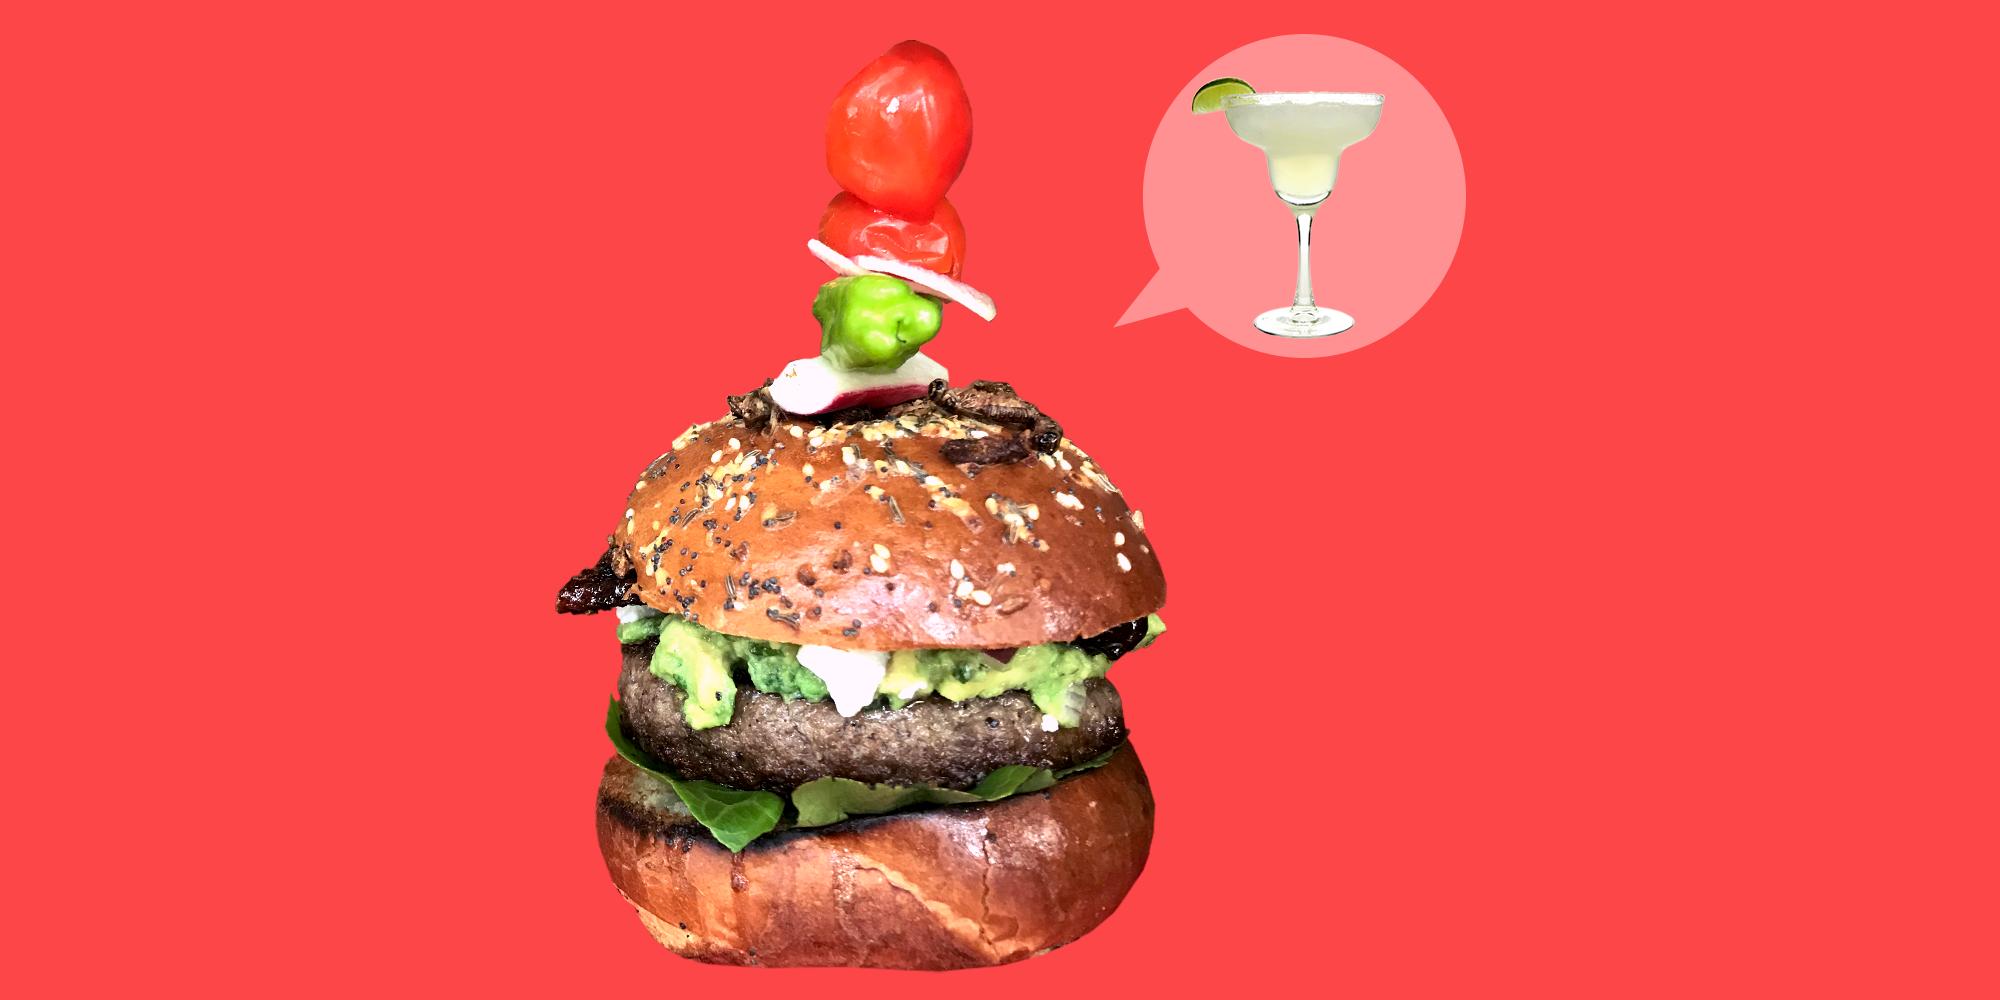 How to Make a Burger That Tastes Like a Margarita Cocktail